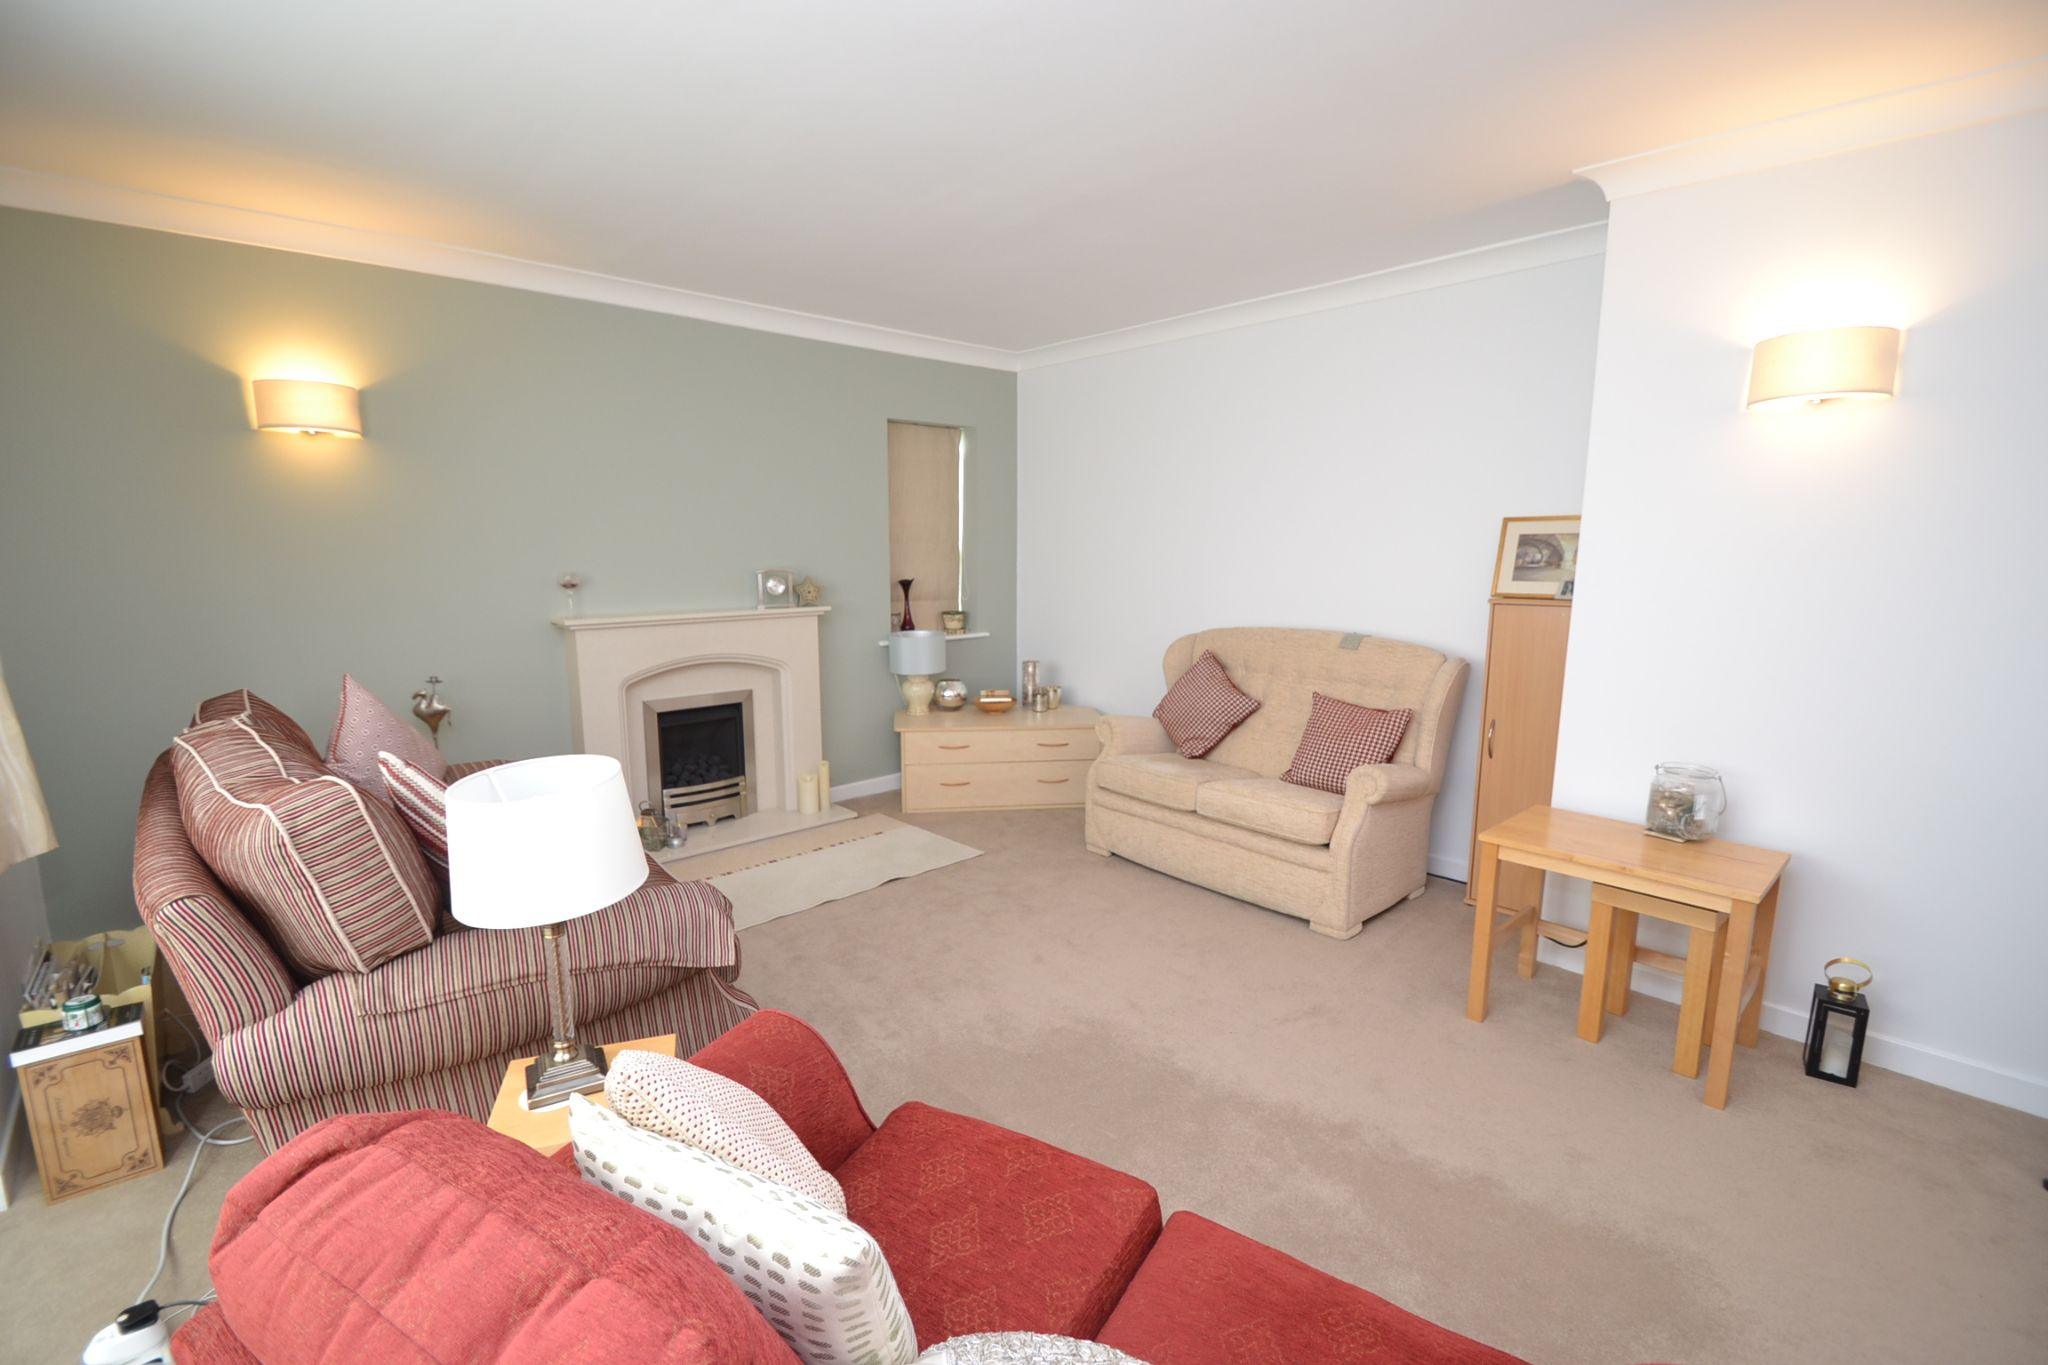 2 Bedroom Semi-detached Dormer House For Sale - Photograph 3